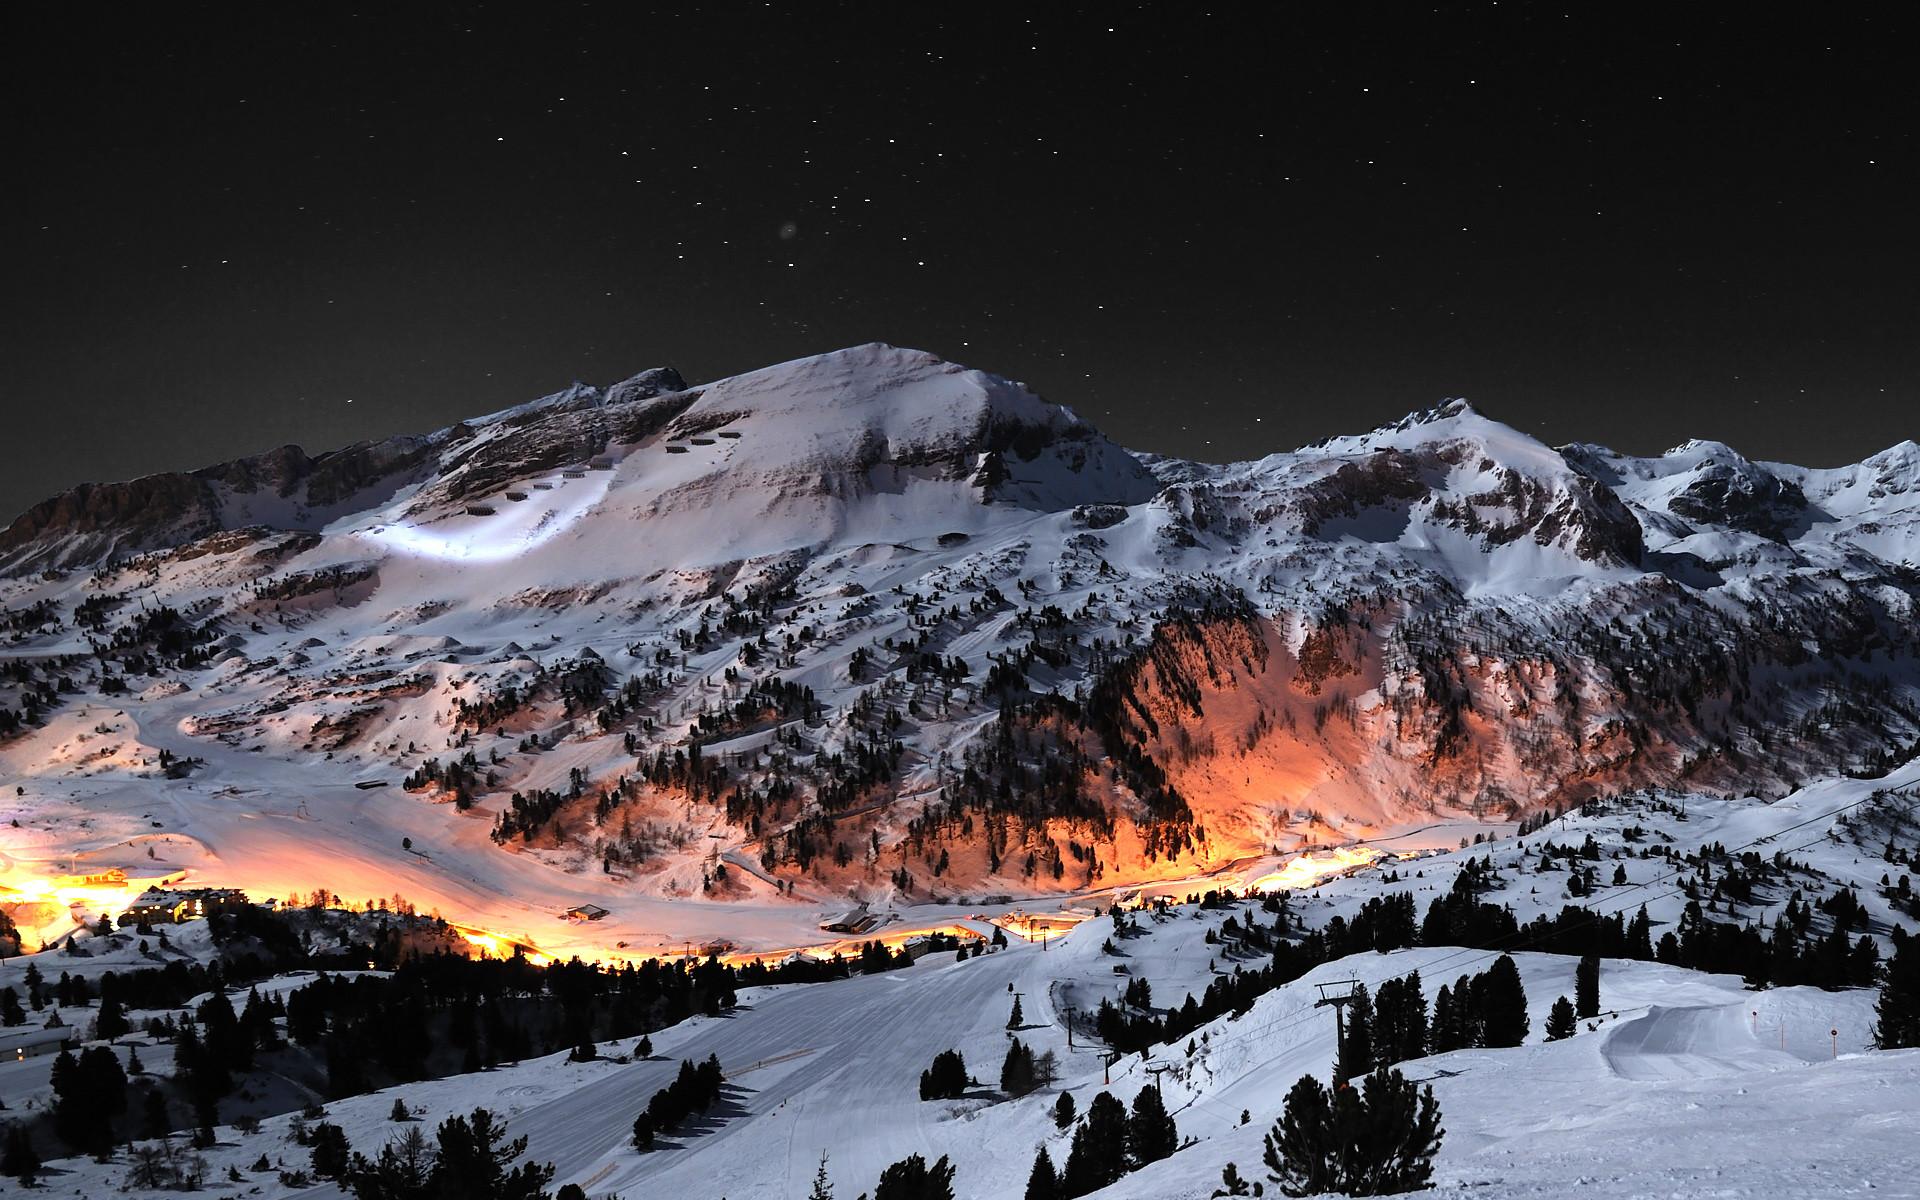 Mountain Wallpaper | Snow Mountains Desktop Backgrounds, wallpaper, Snow  Mountains Desktop .